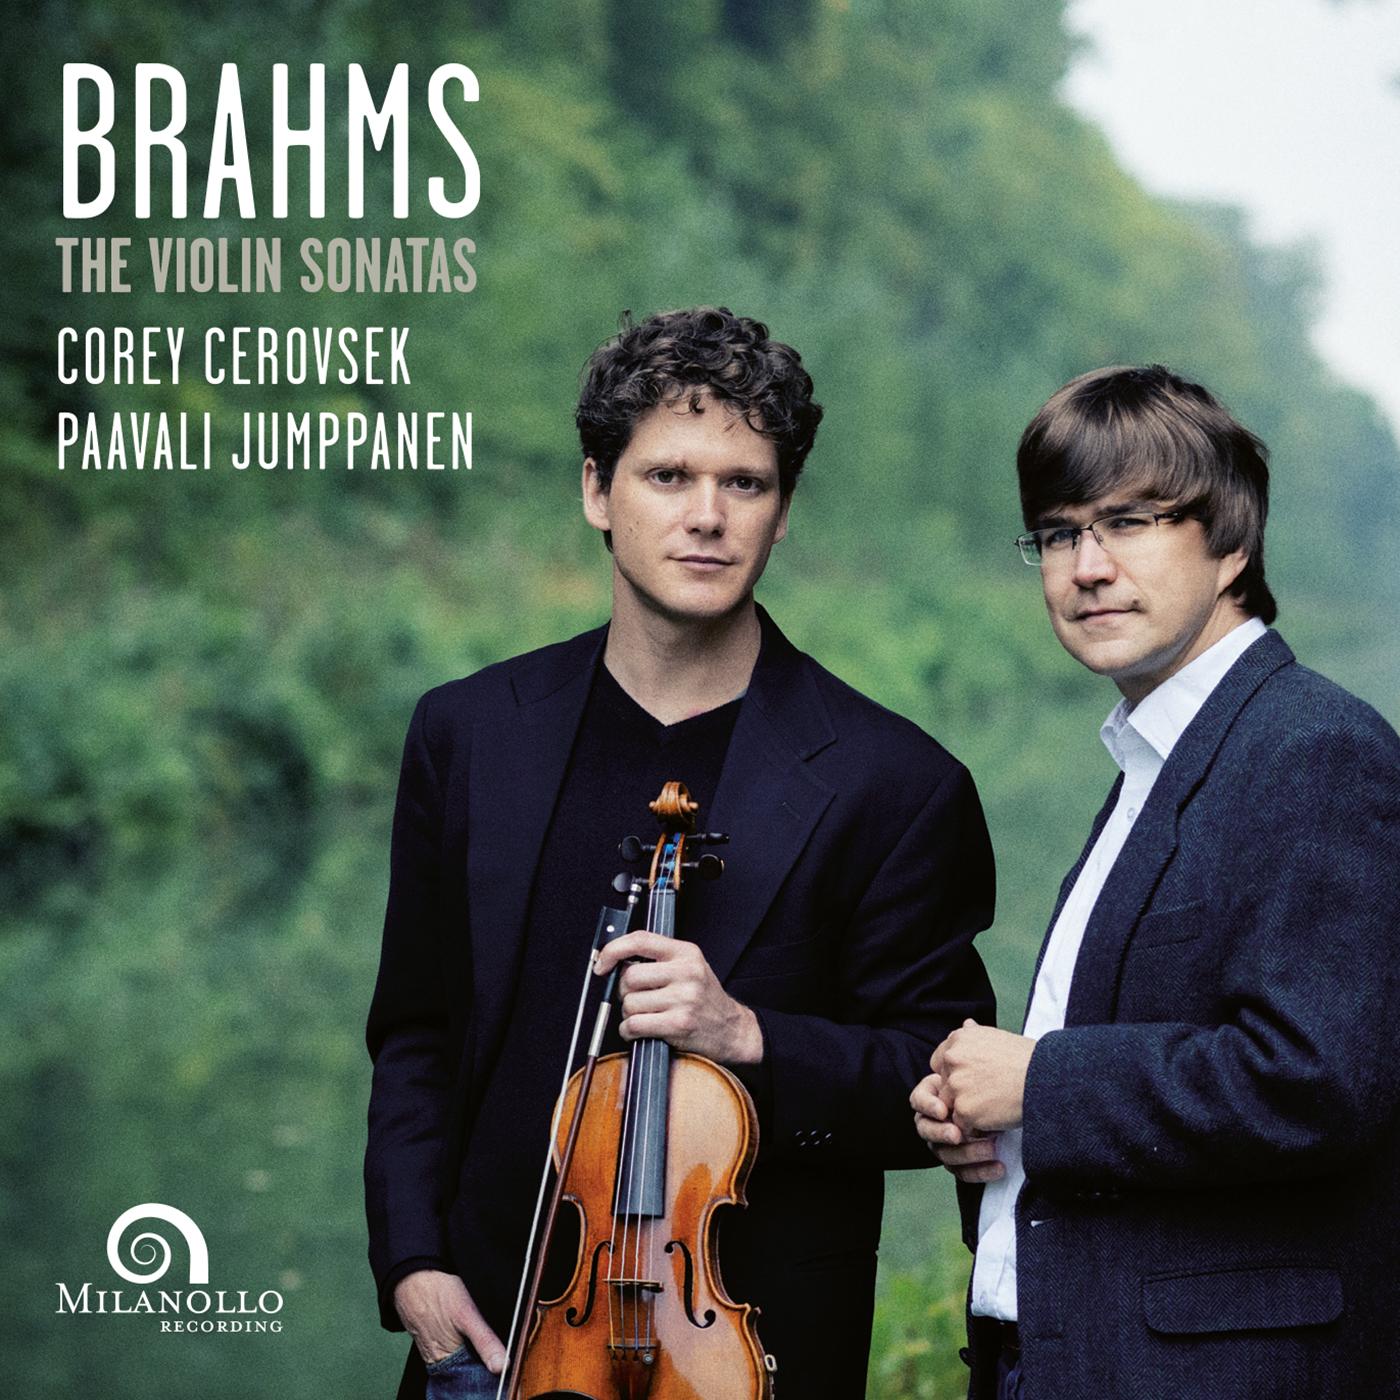 Brahms_-_Corey_Cerovsek_-_COVER.jpeg